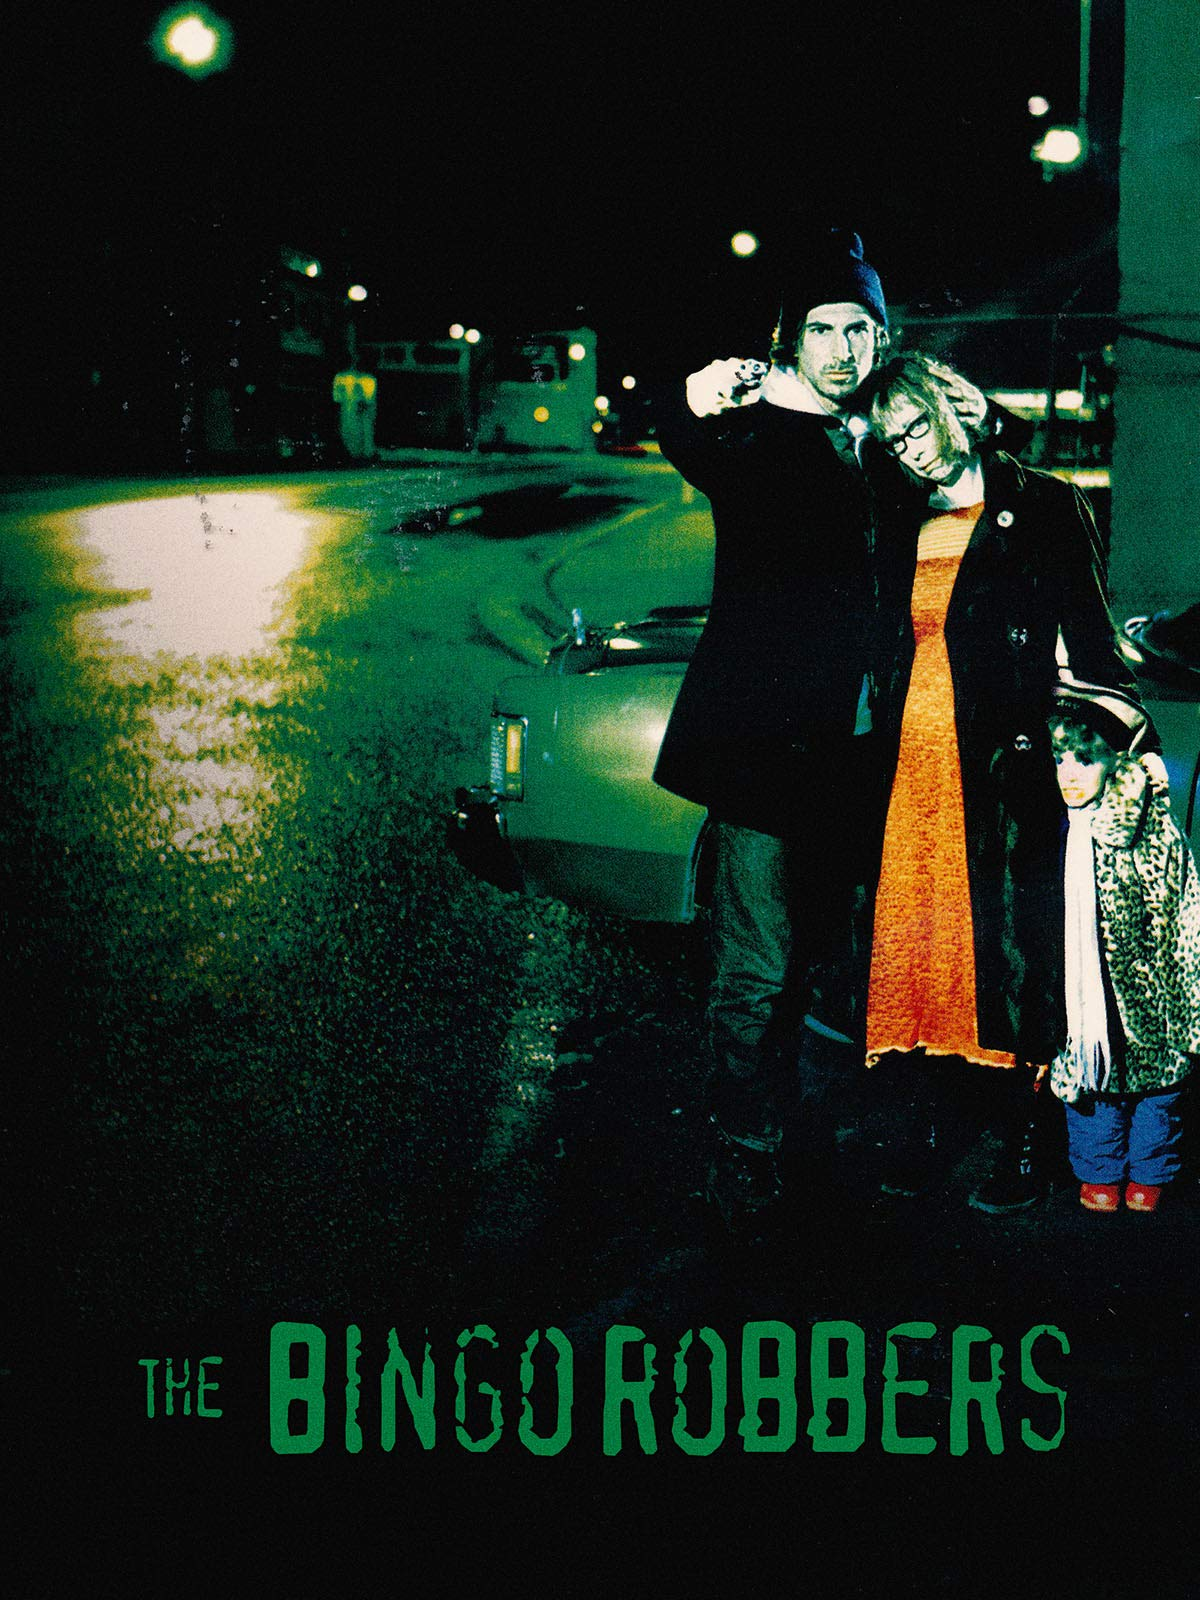 The Bingo Robbers